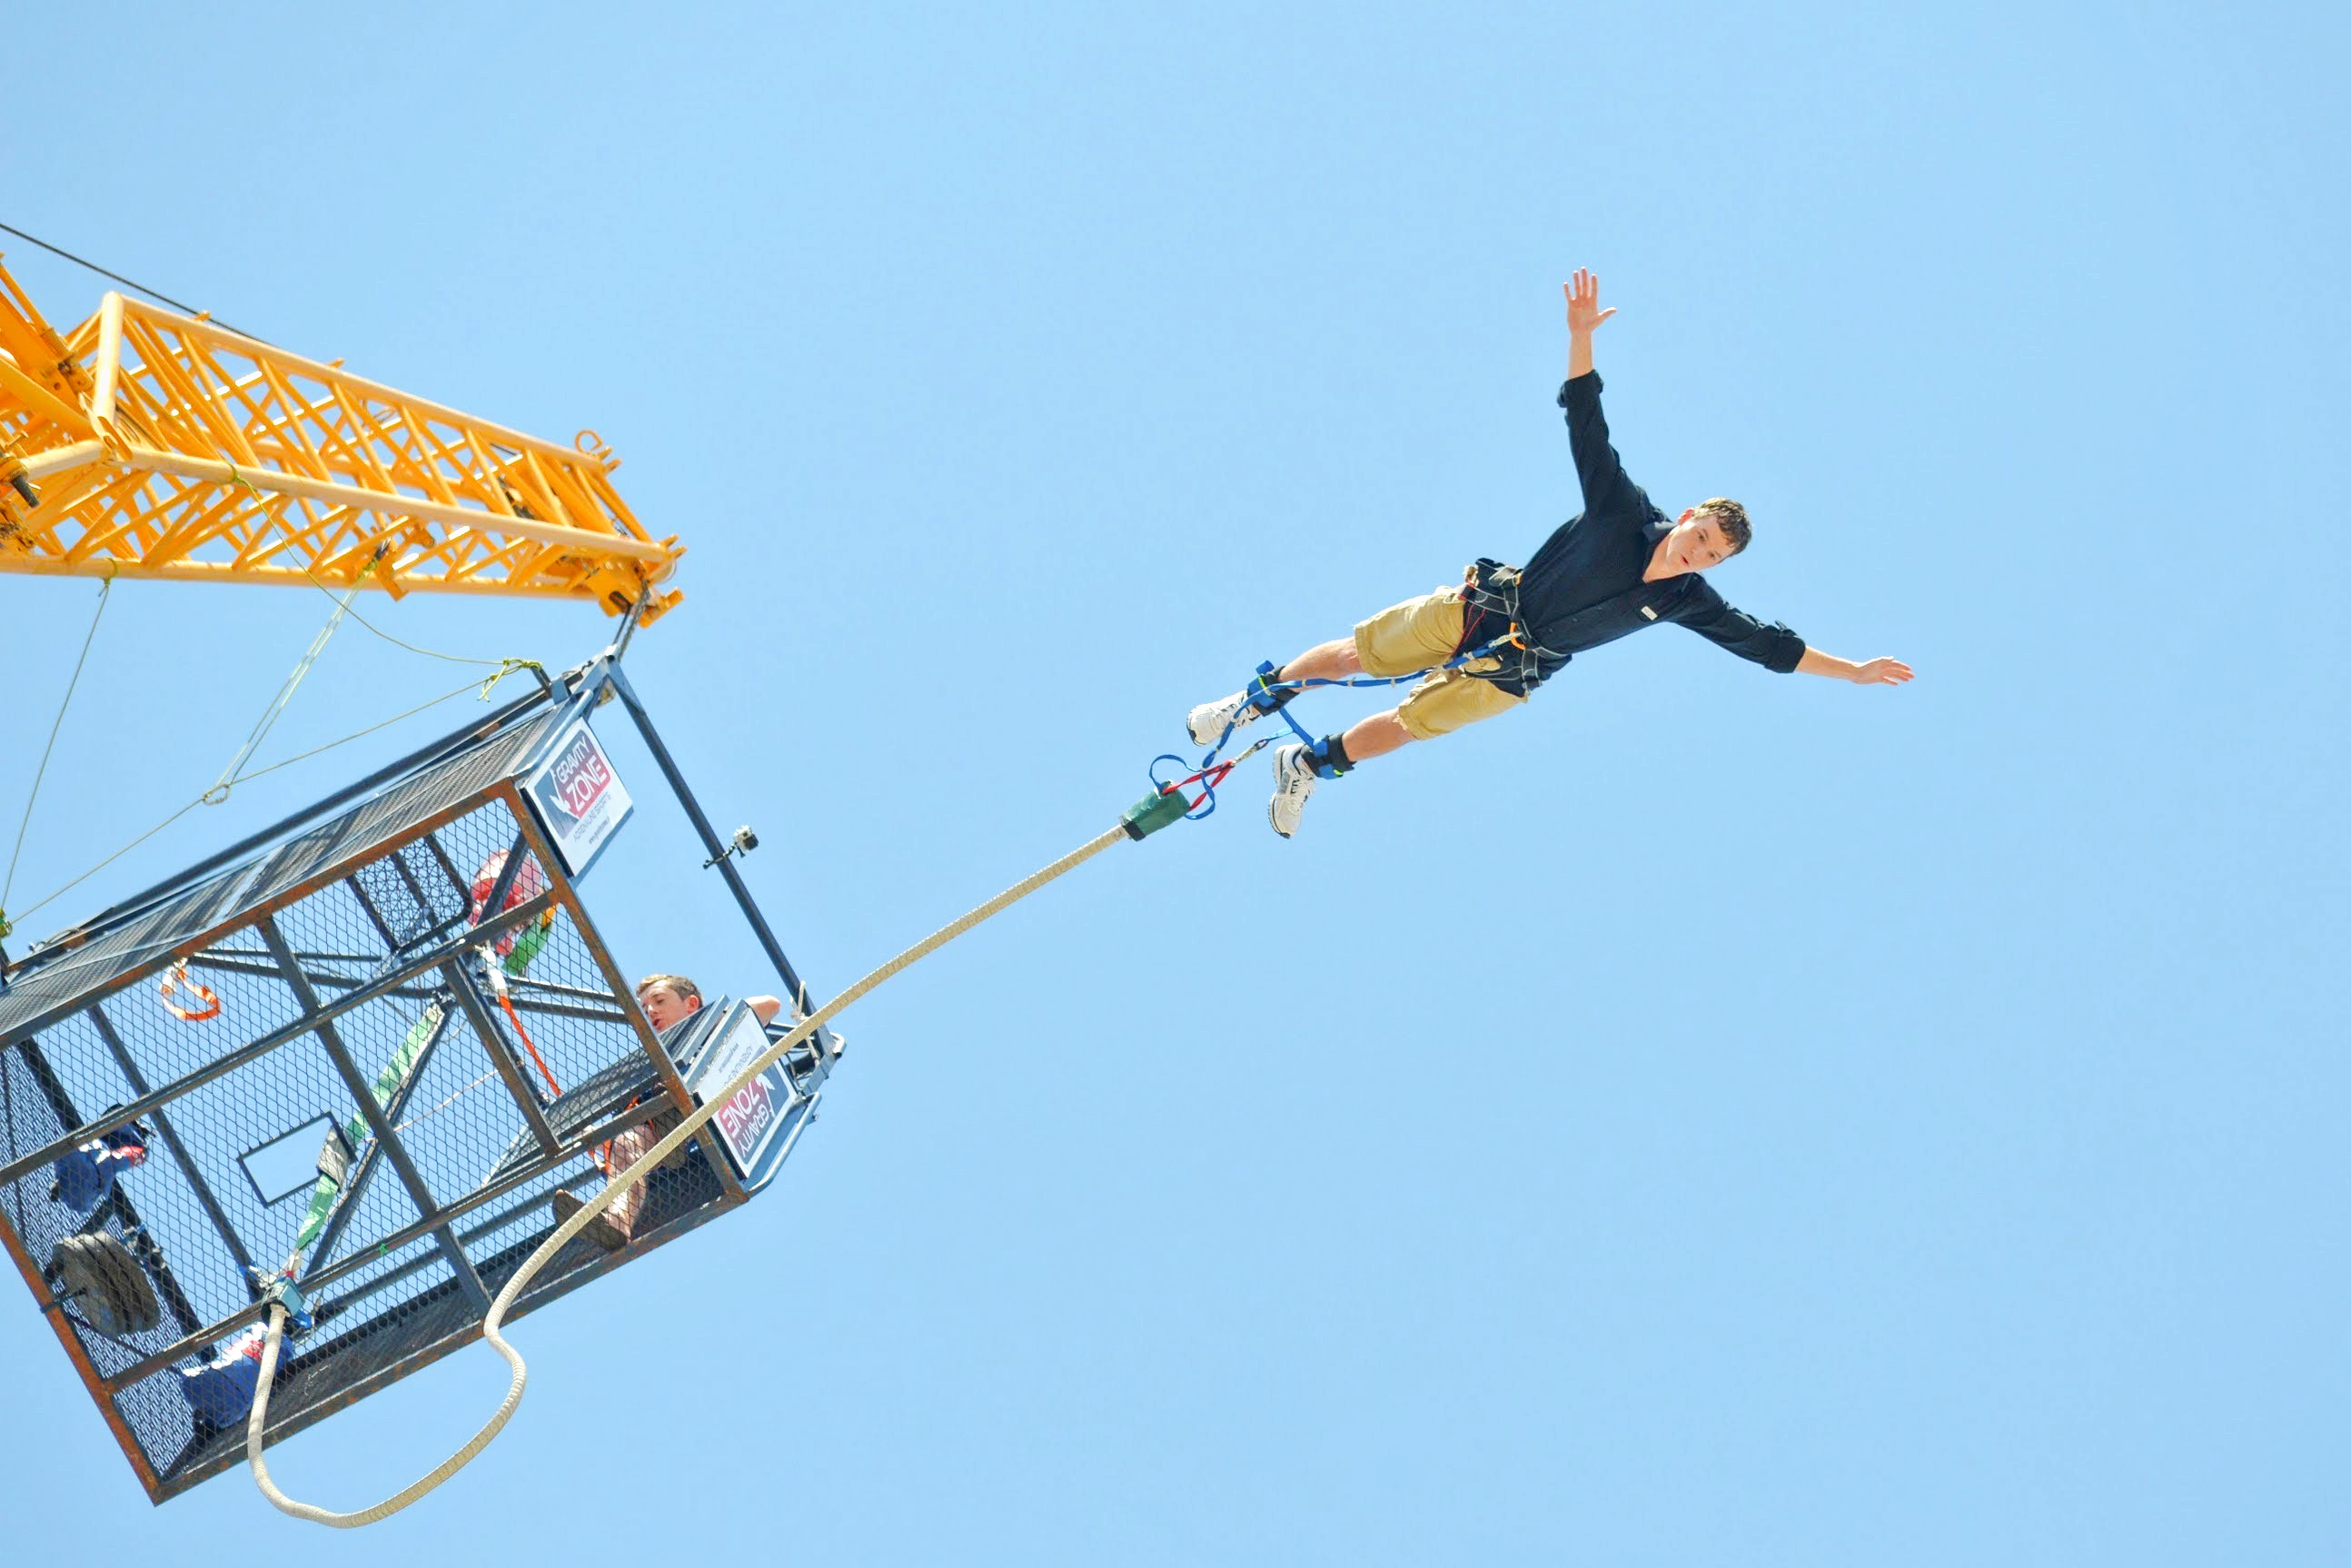 1511257901_bungee-jumping-dubai1.jpg